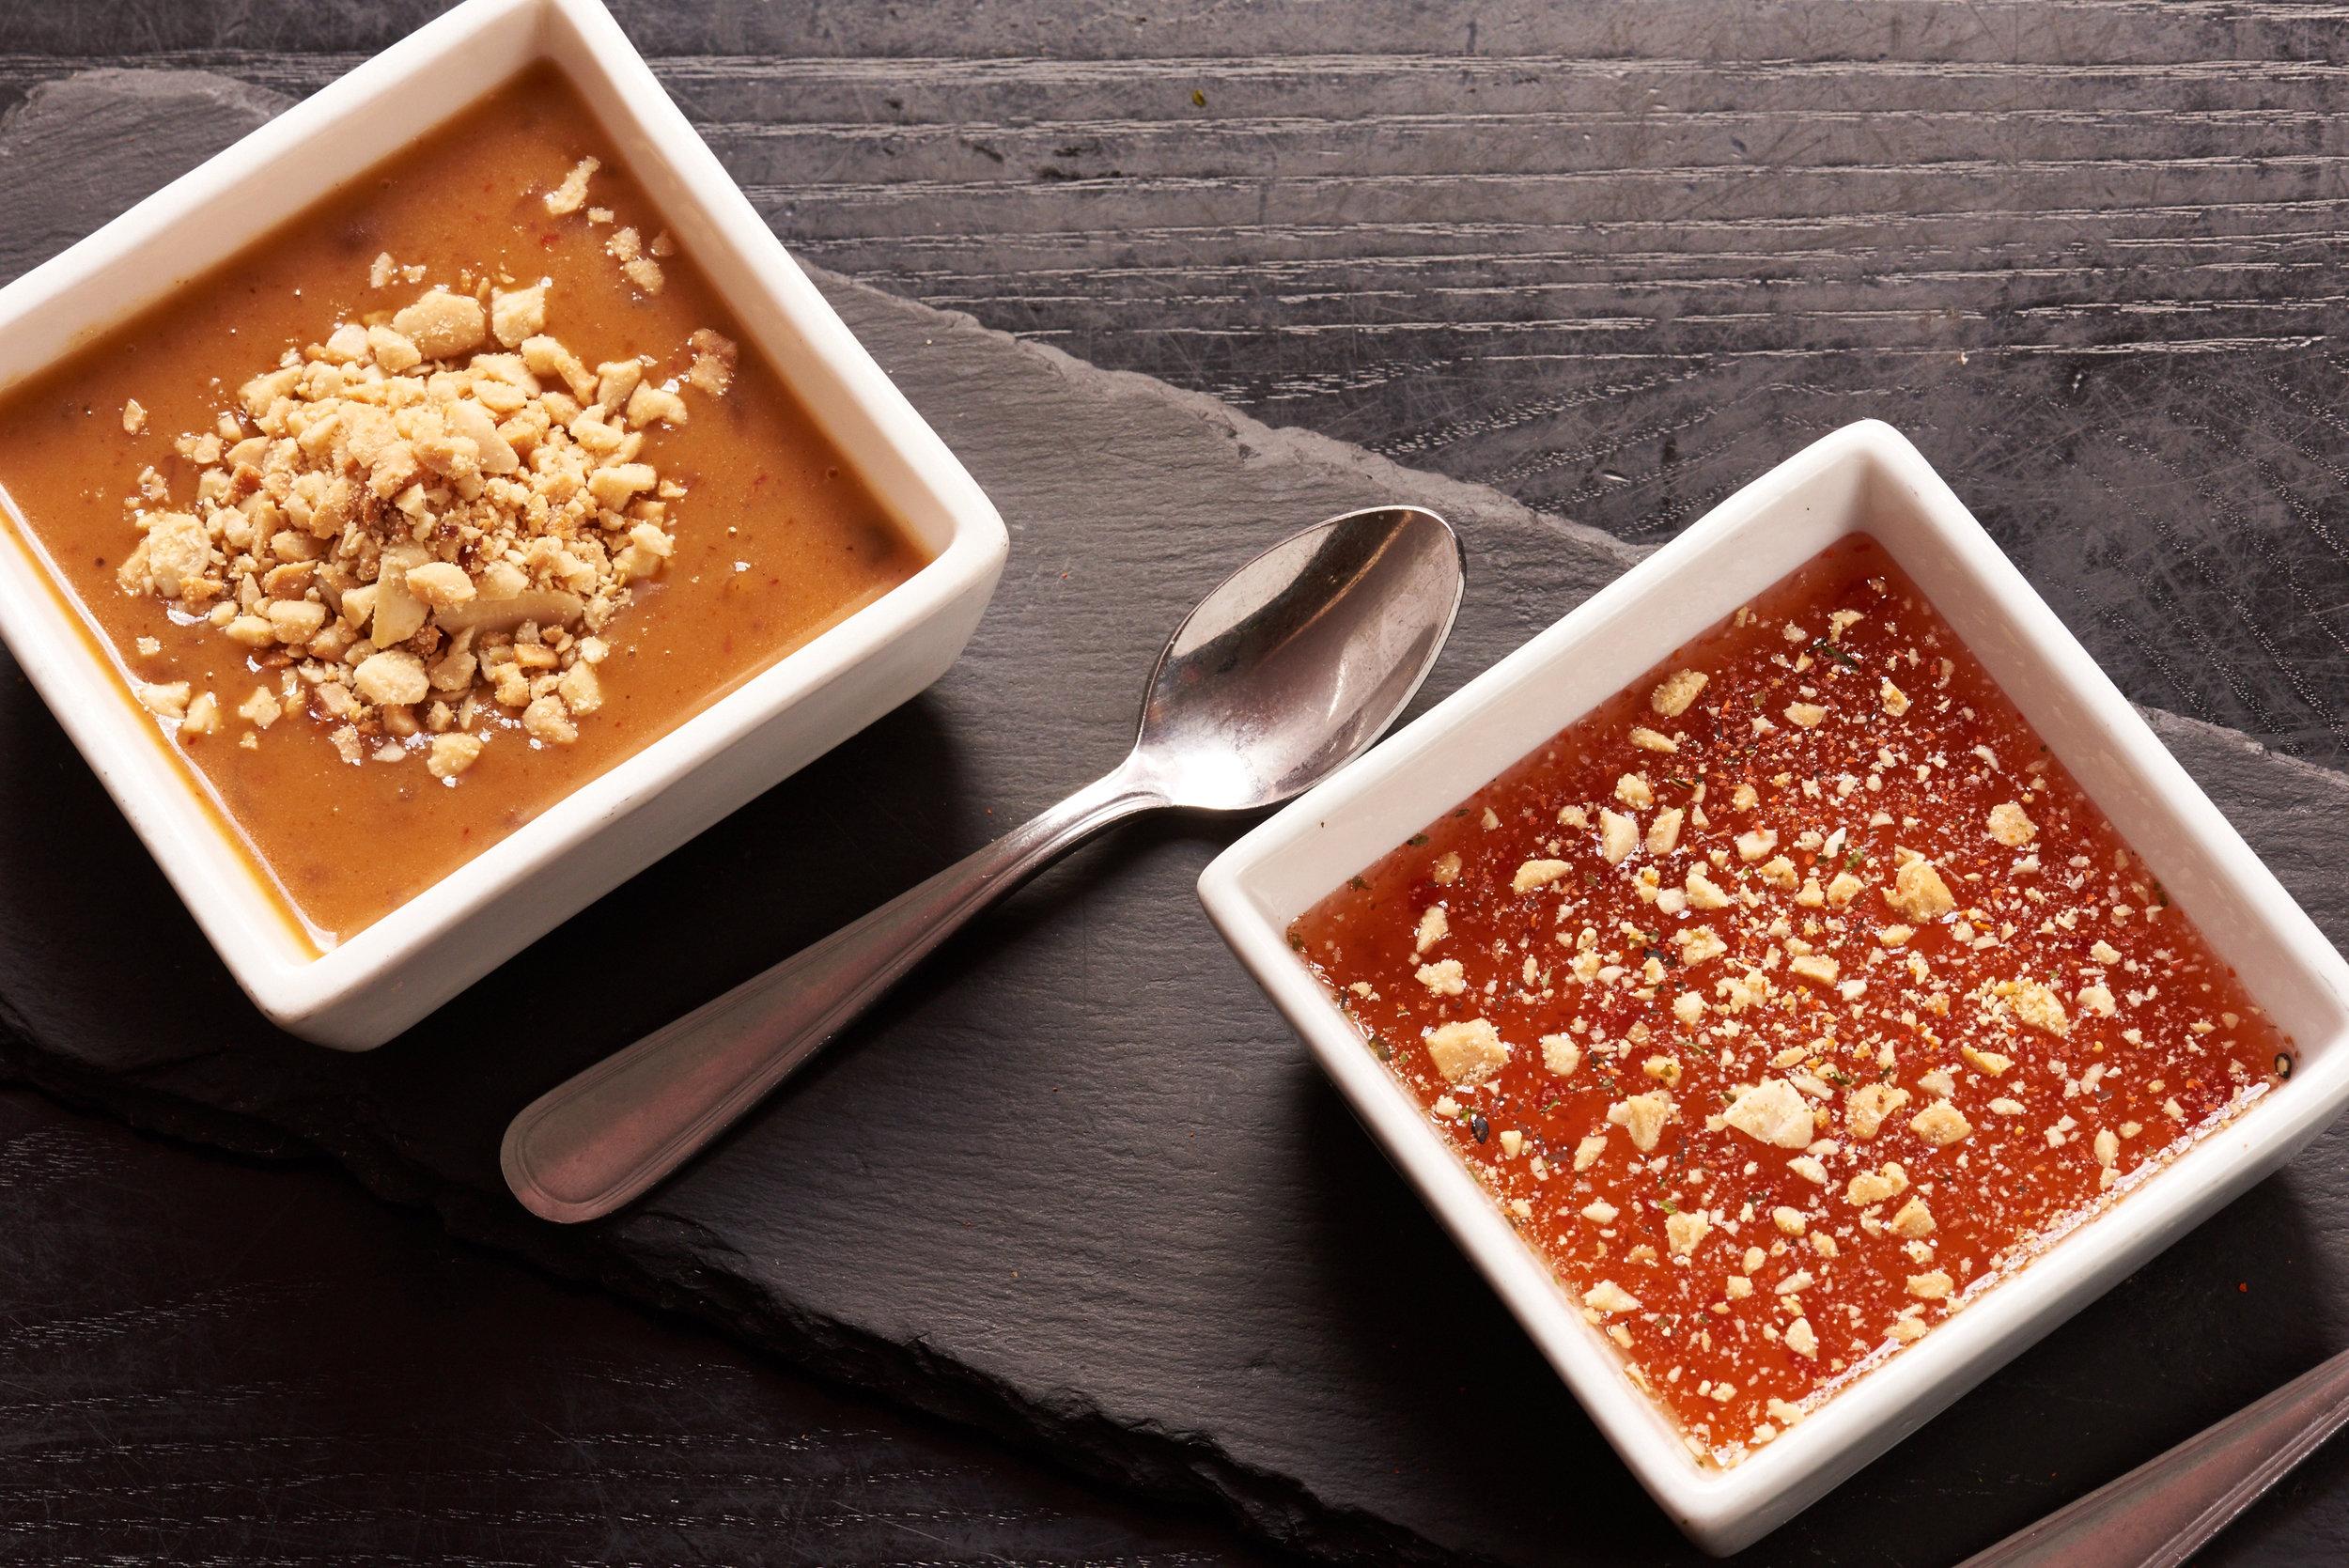 27-Peanut-sauce-&-sweet-and-sower-sauce.jpg